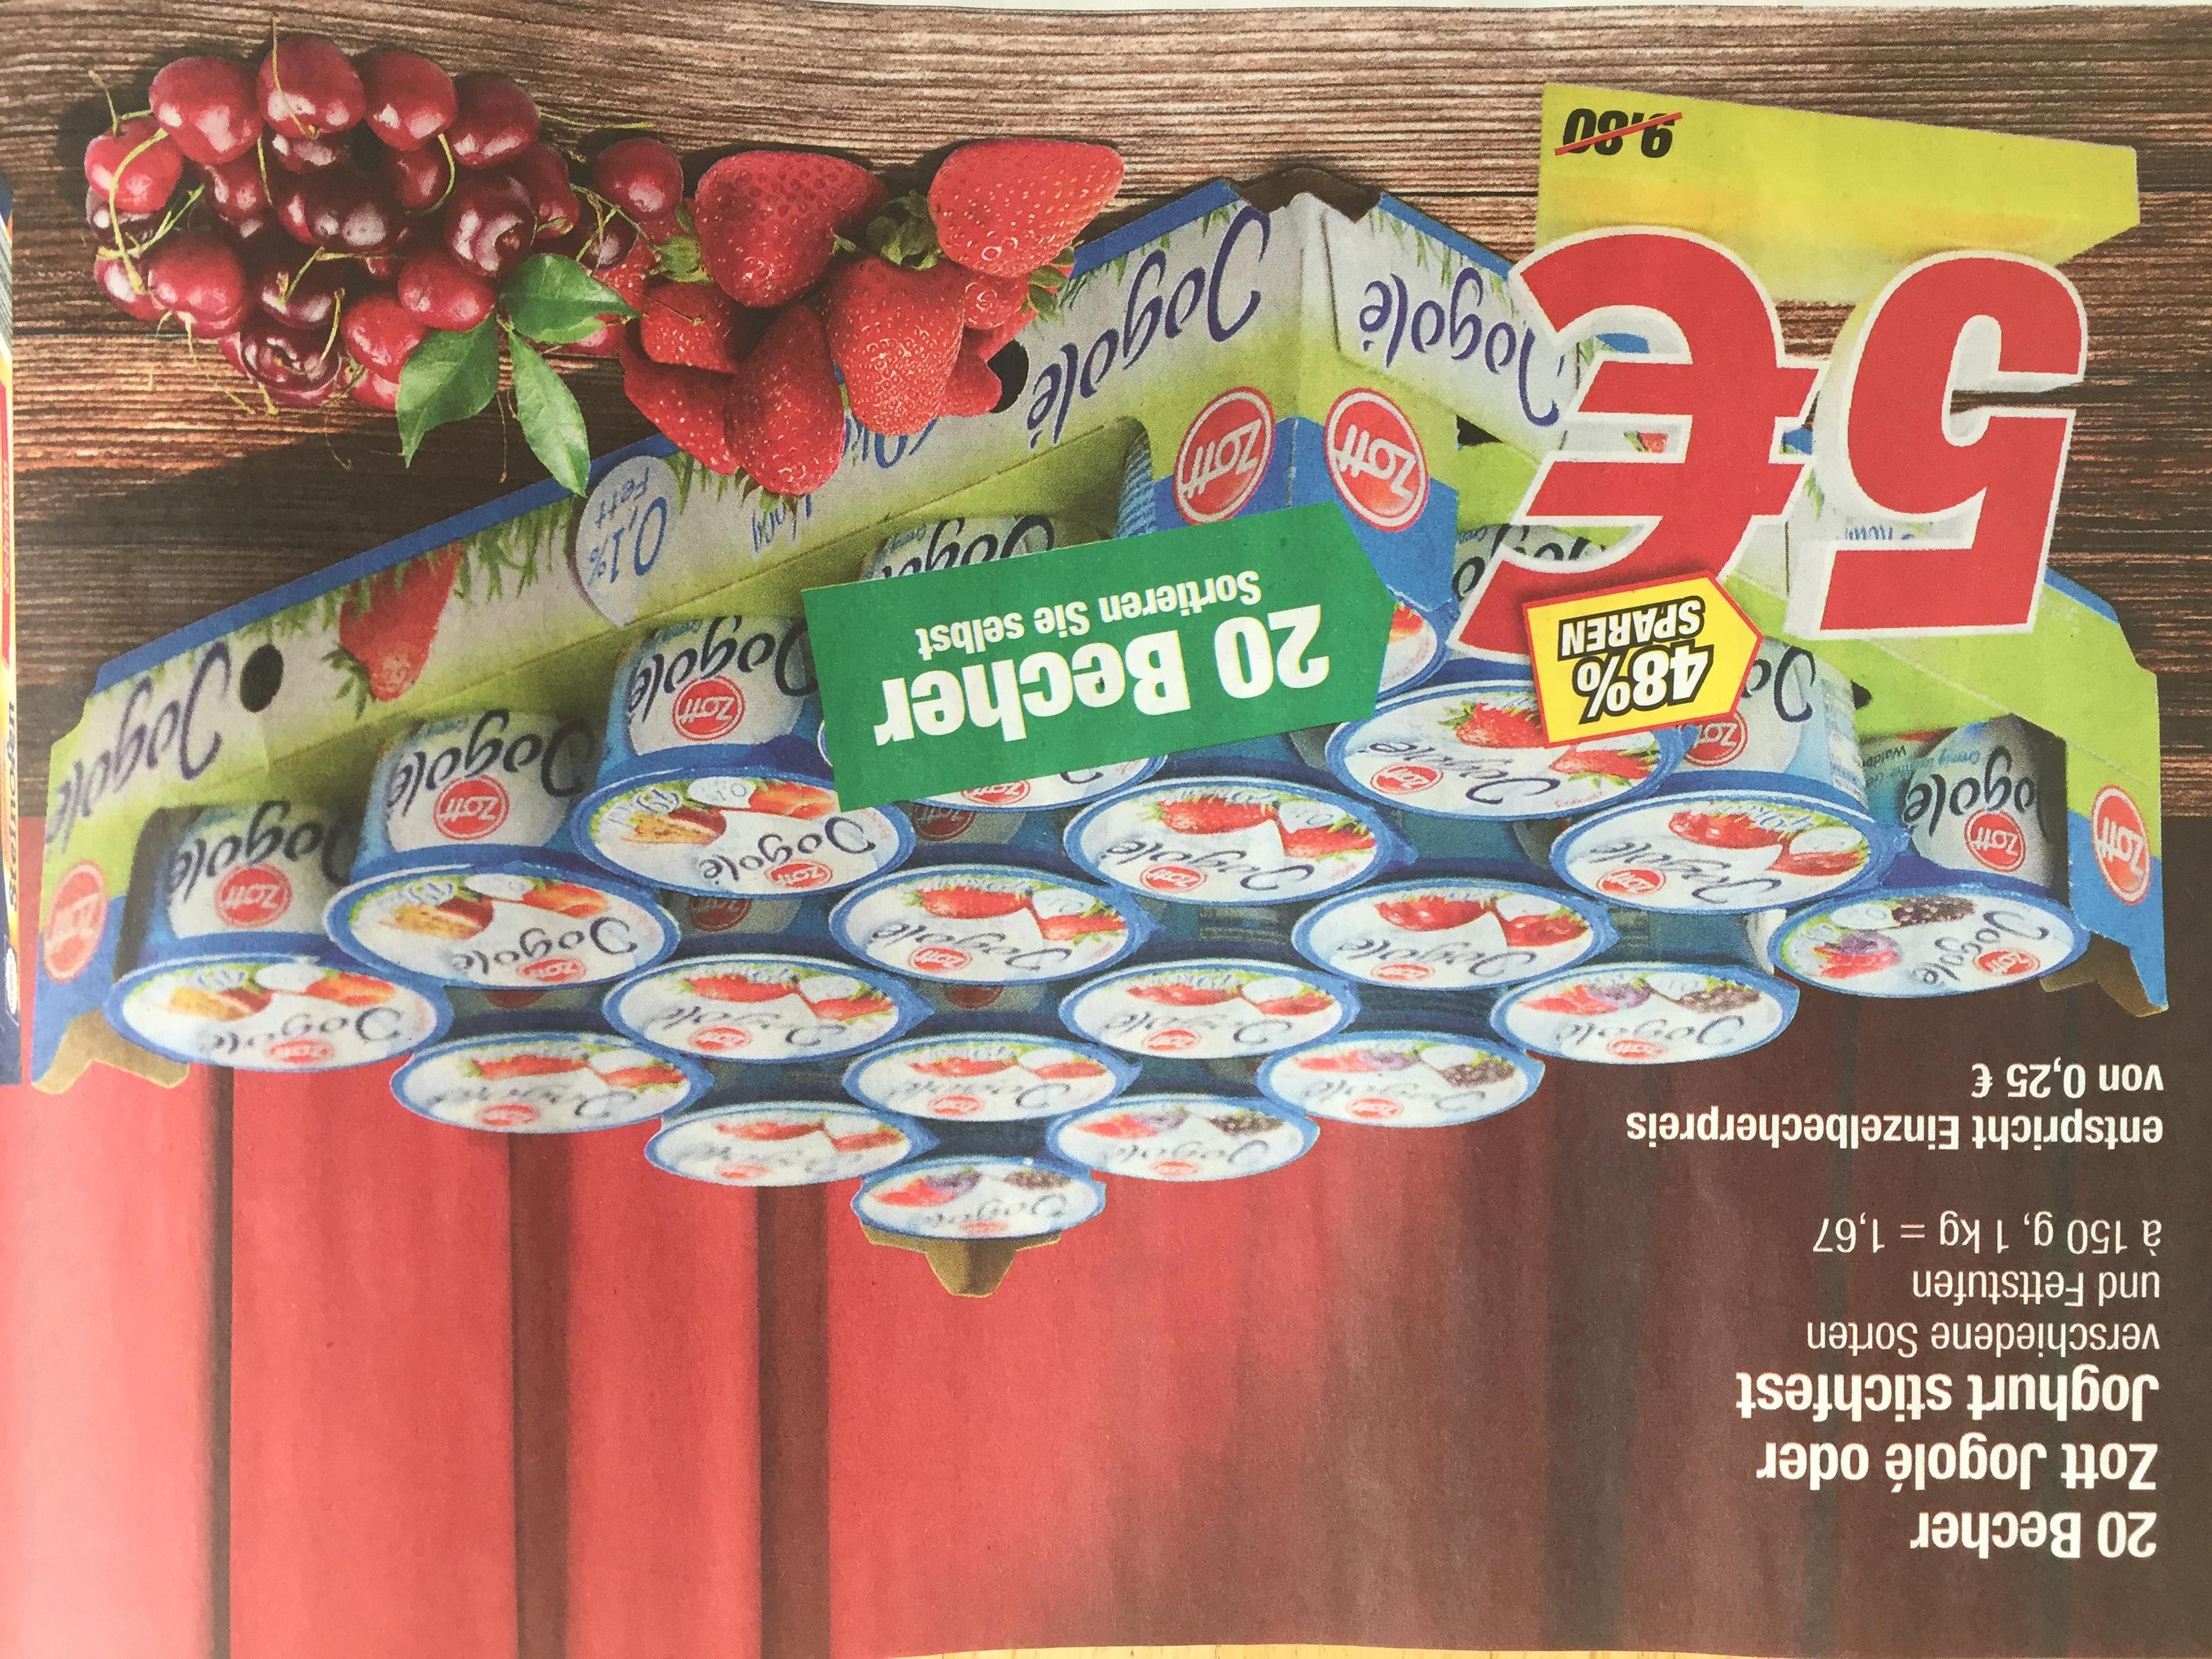 [offline] Marktkauf: 20 x Zott Jogolé oder Joghurt stichfest